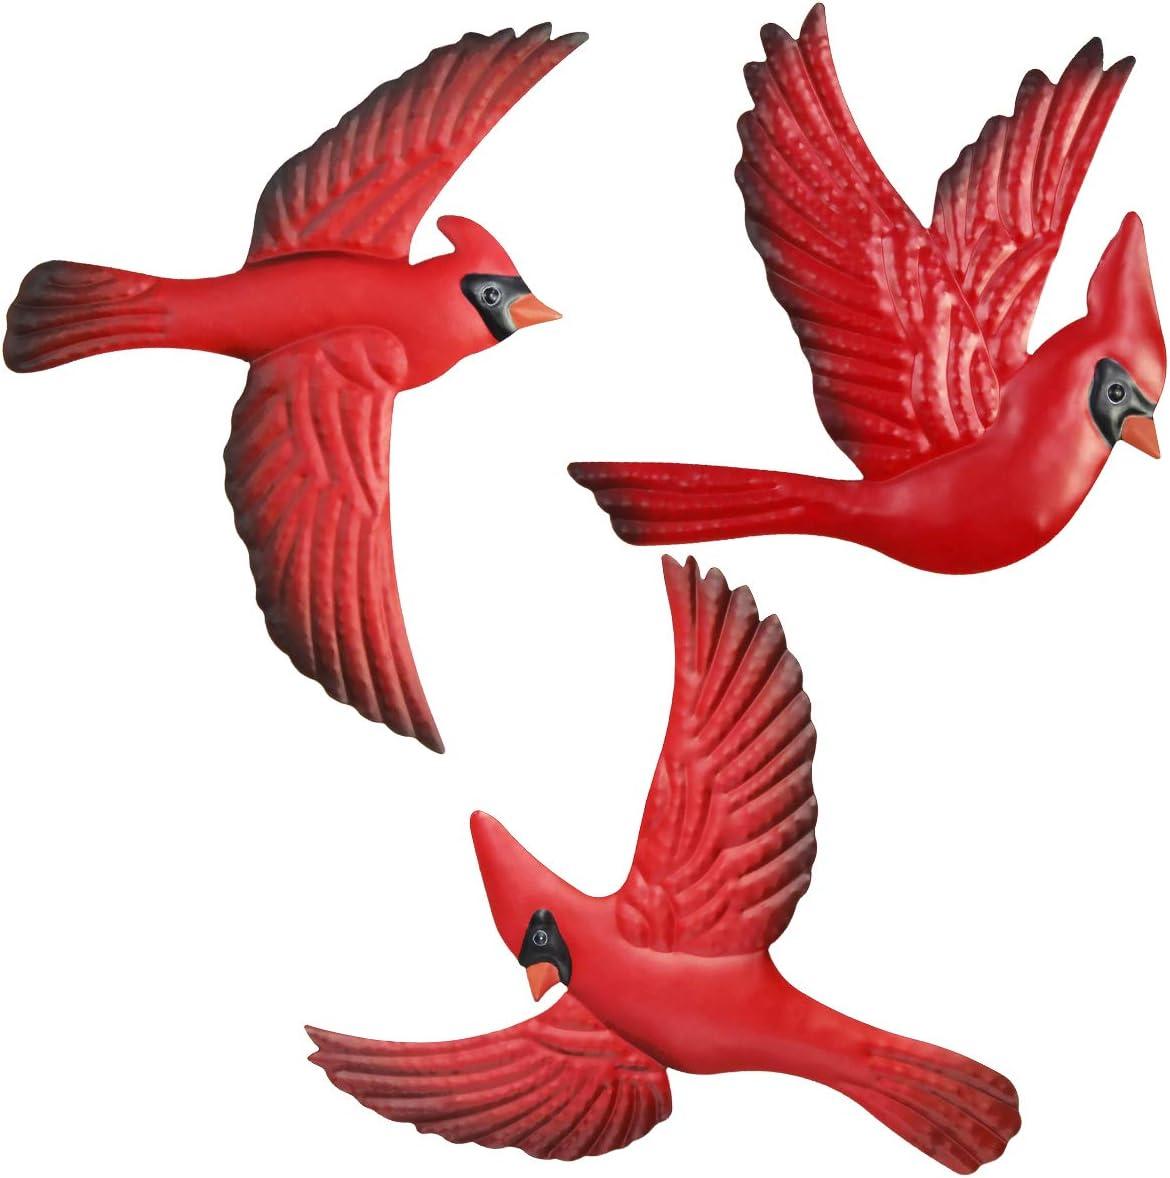 FANWNKI Red Metal Birds Set of 3 Wall Art Decor Sculptures Hanging for Christmas Outdoor Indoor Home Garden Porch Fence